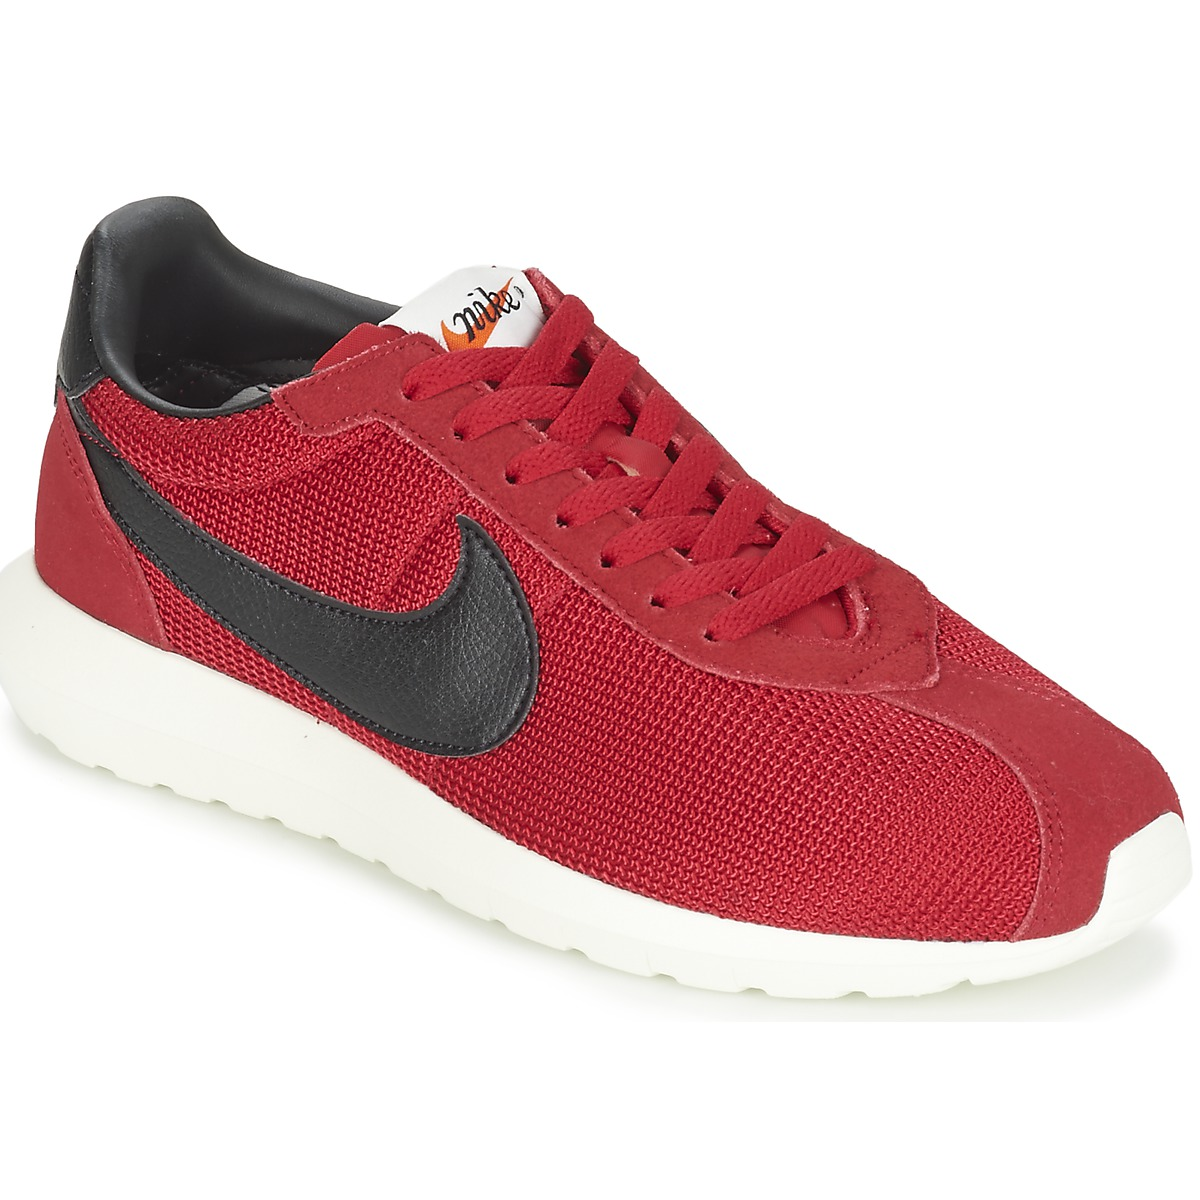 Nike ROSHE LD-1000 Rot / Schwarz - Kostenloser Versand bei Spartoode ! - Schuhe Sneaker Low Herren 59,99 €